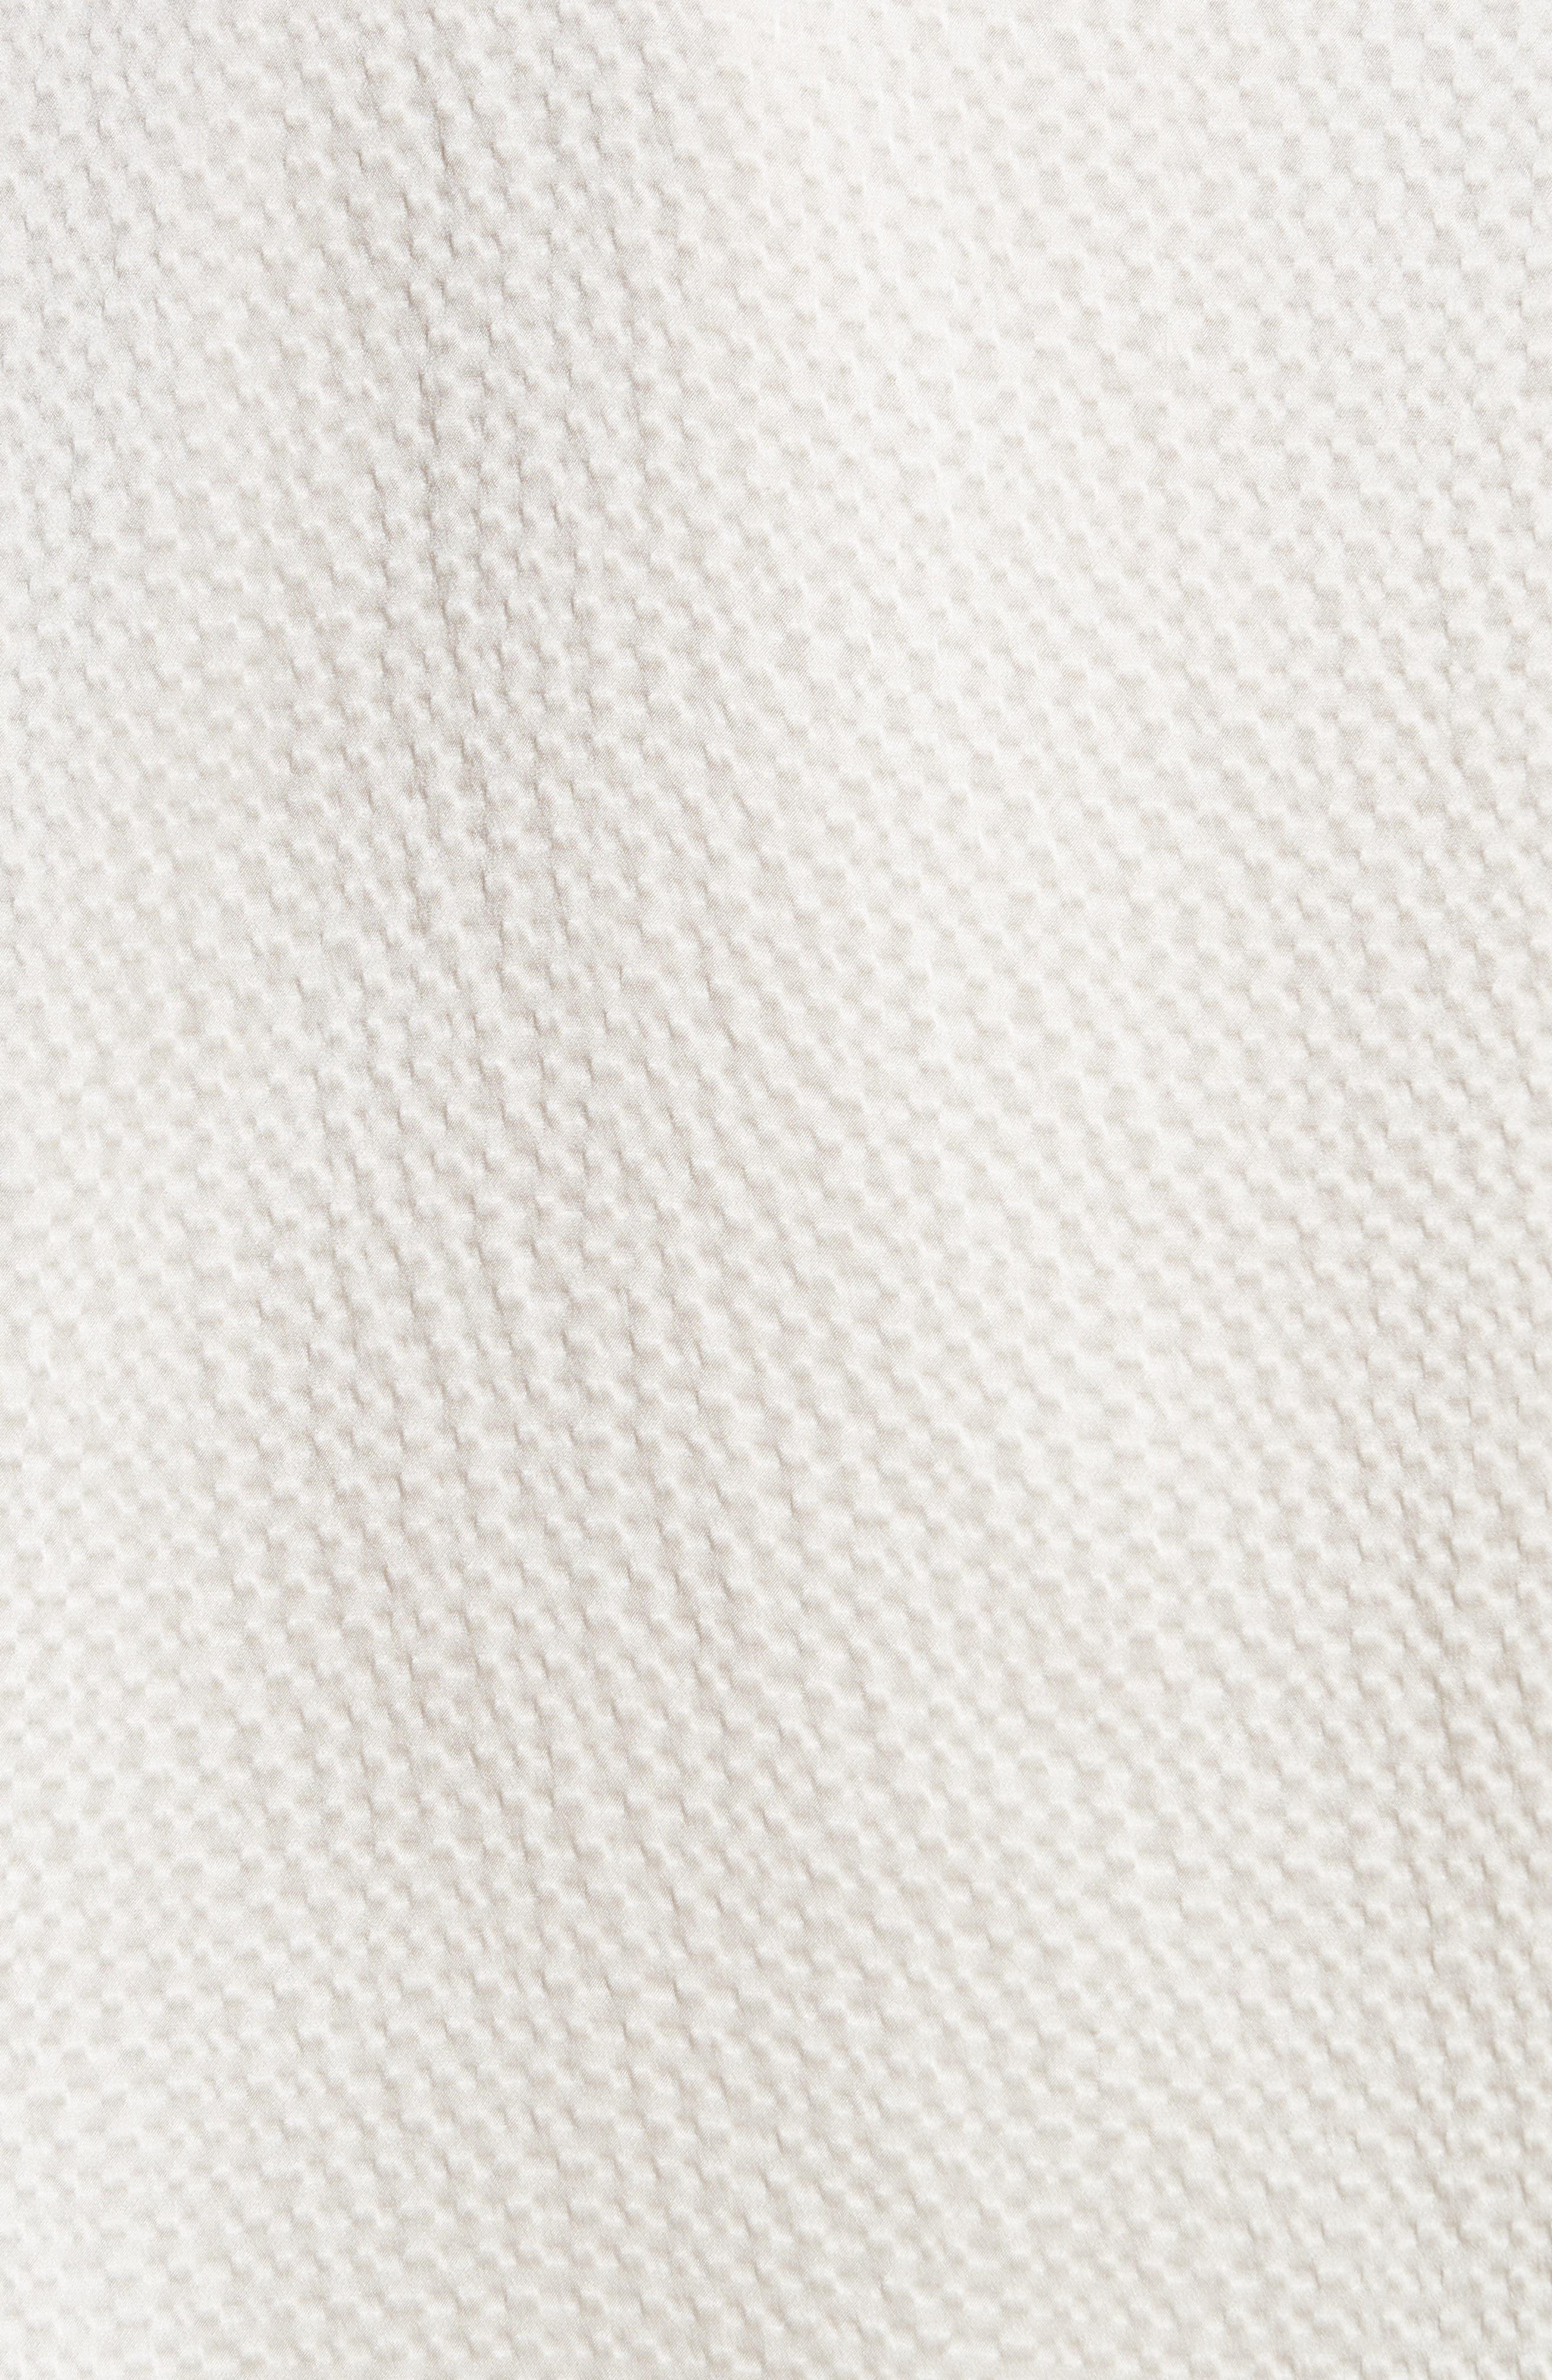 Esker Silk Top,                             Alternate thumbnail 5, color,                             905